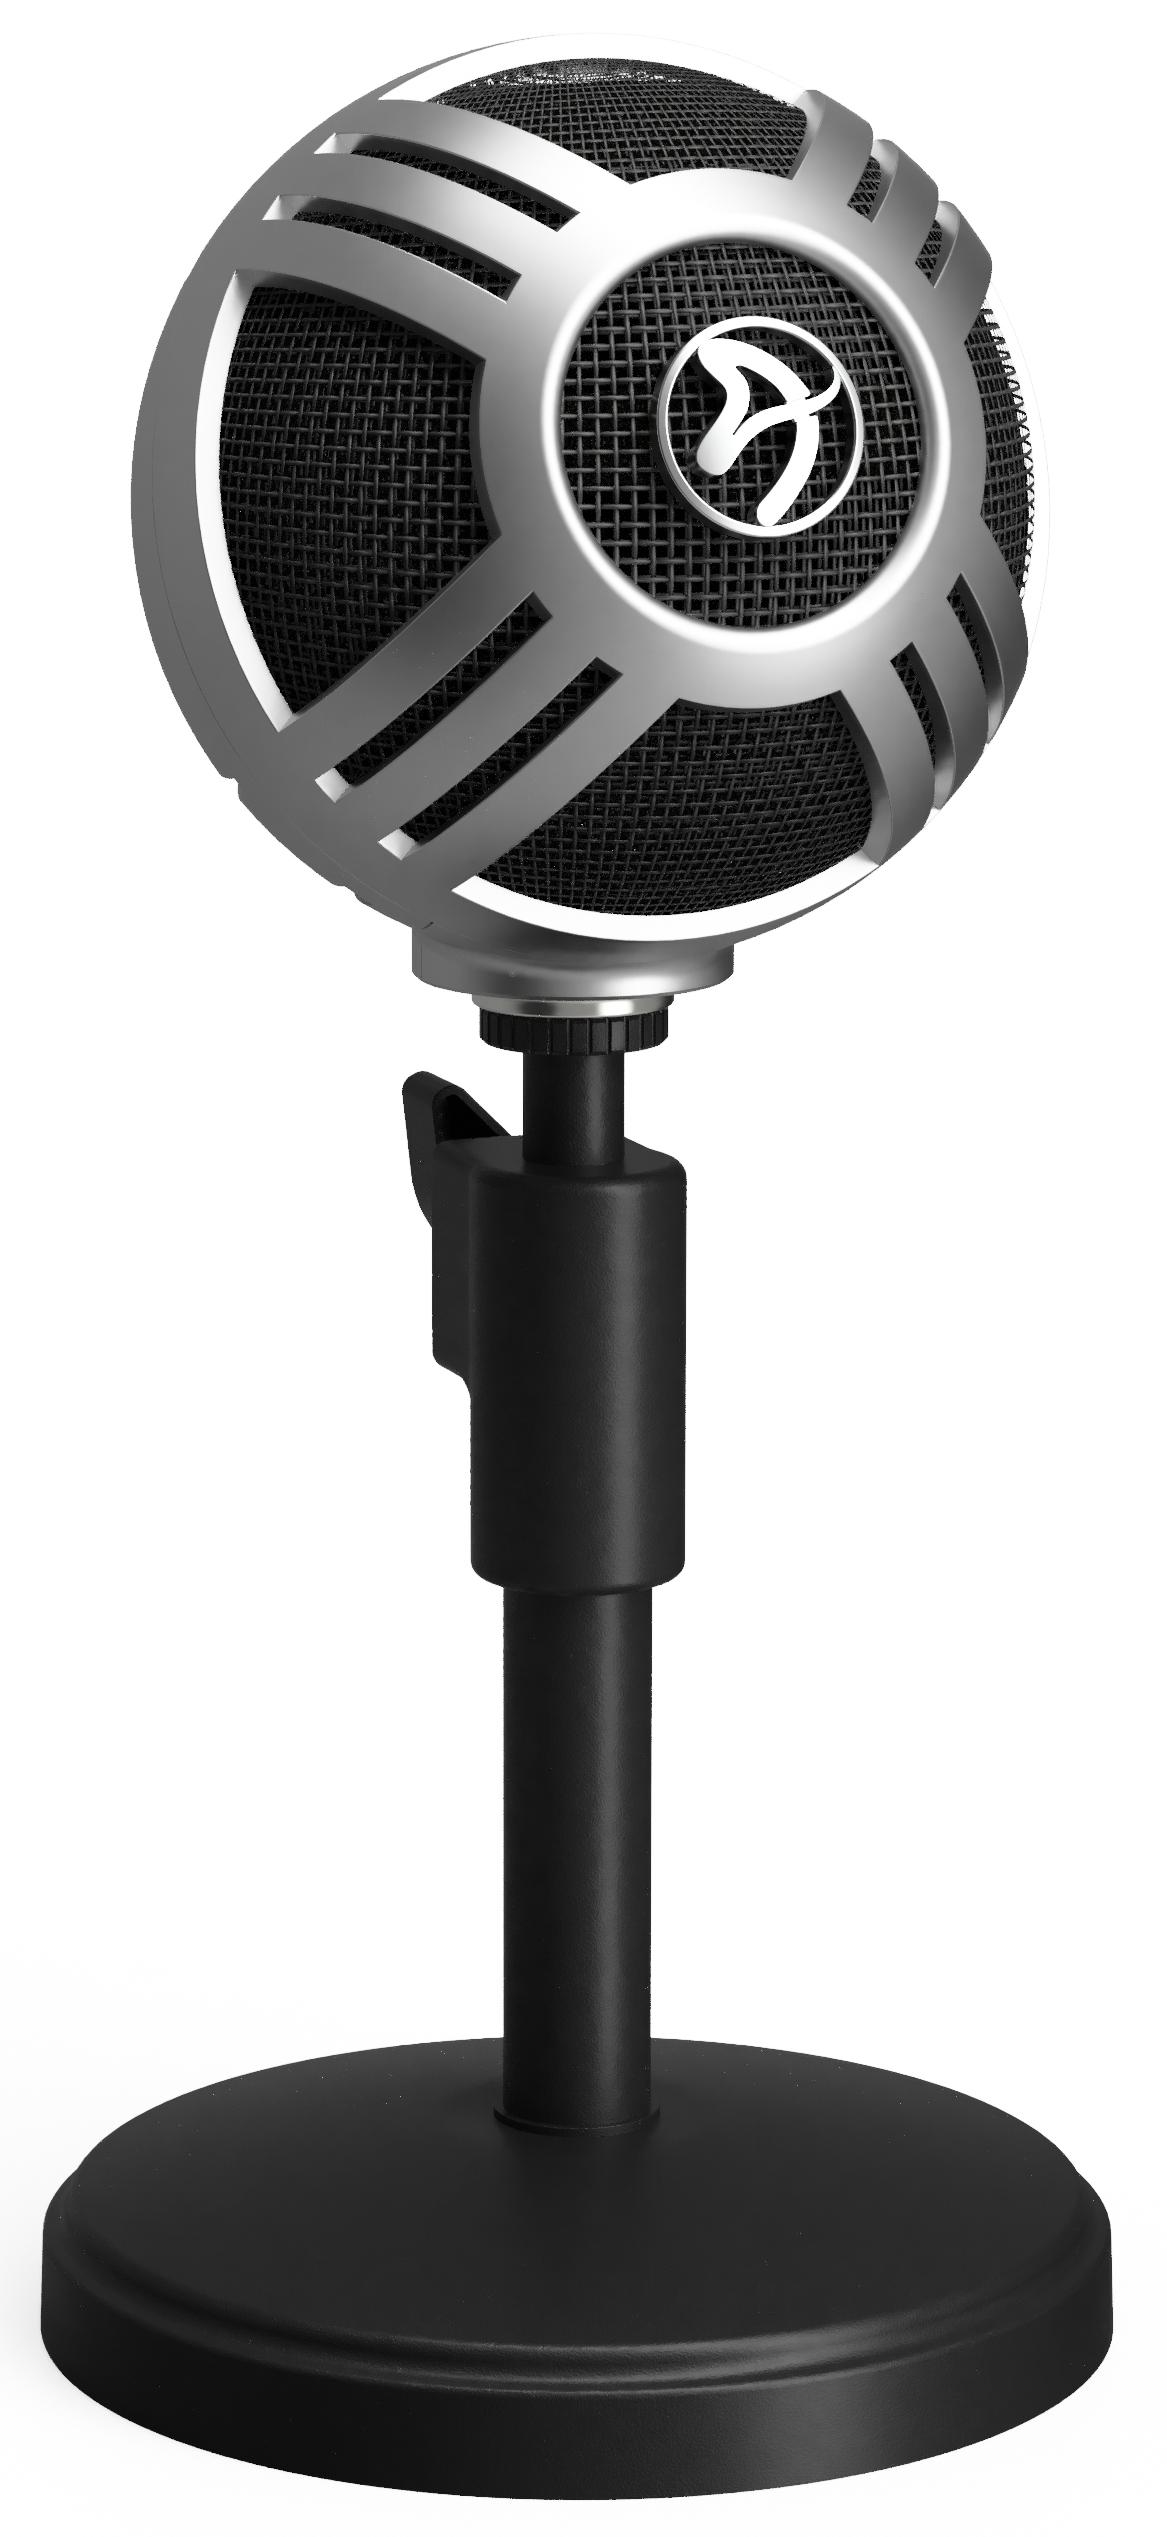 Цифровой микрофон Arozzi Sfera Pro (Silver)